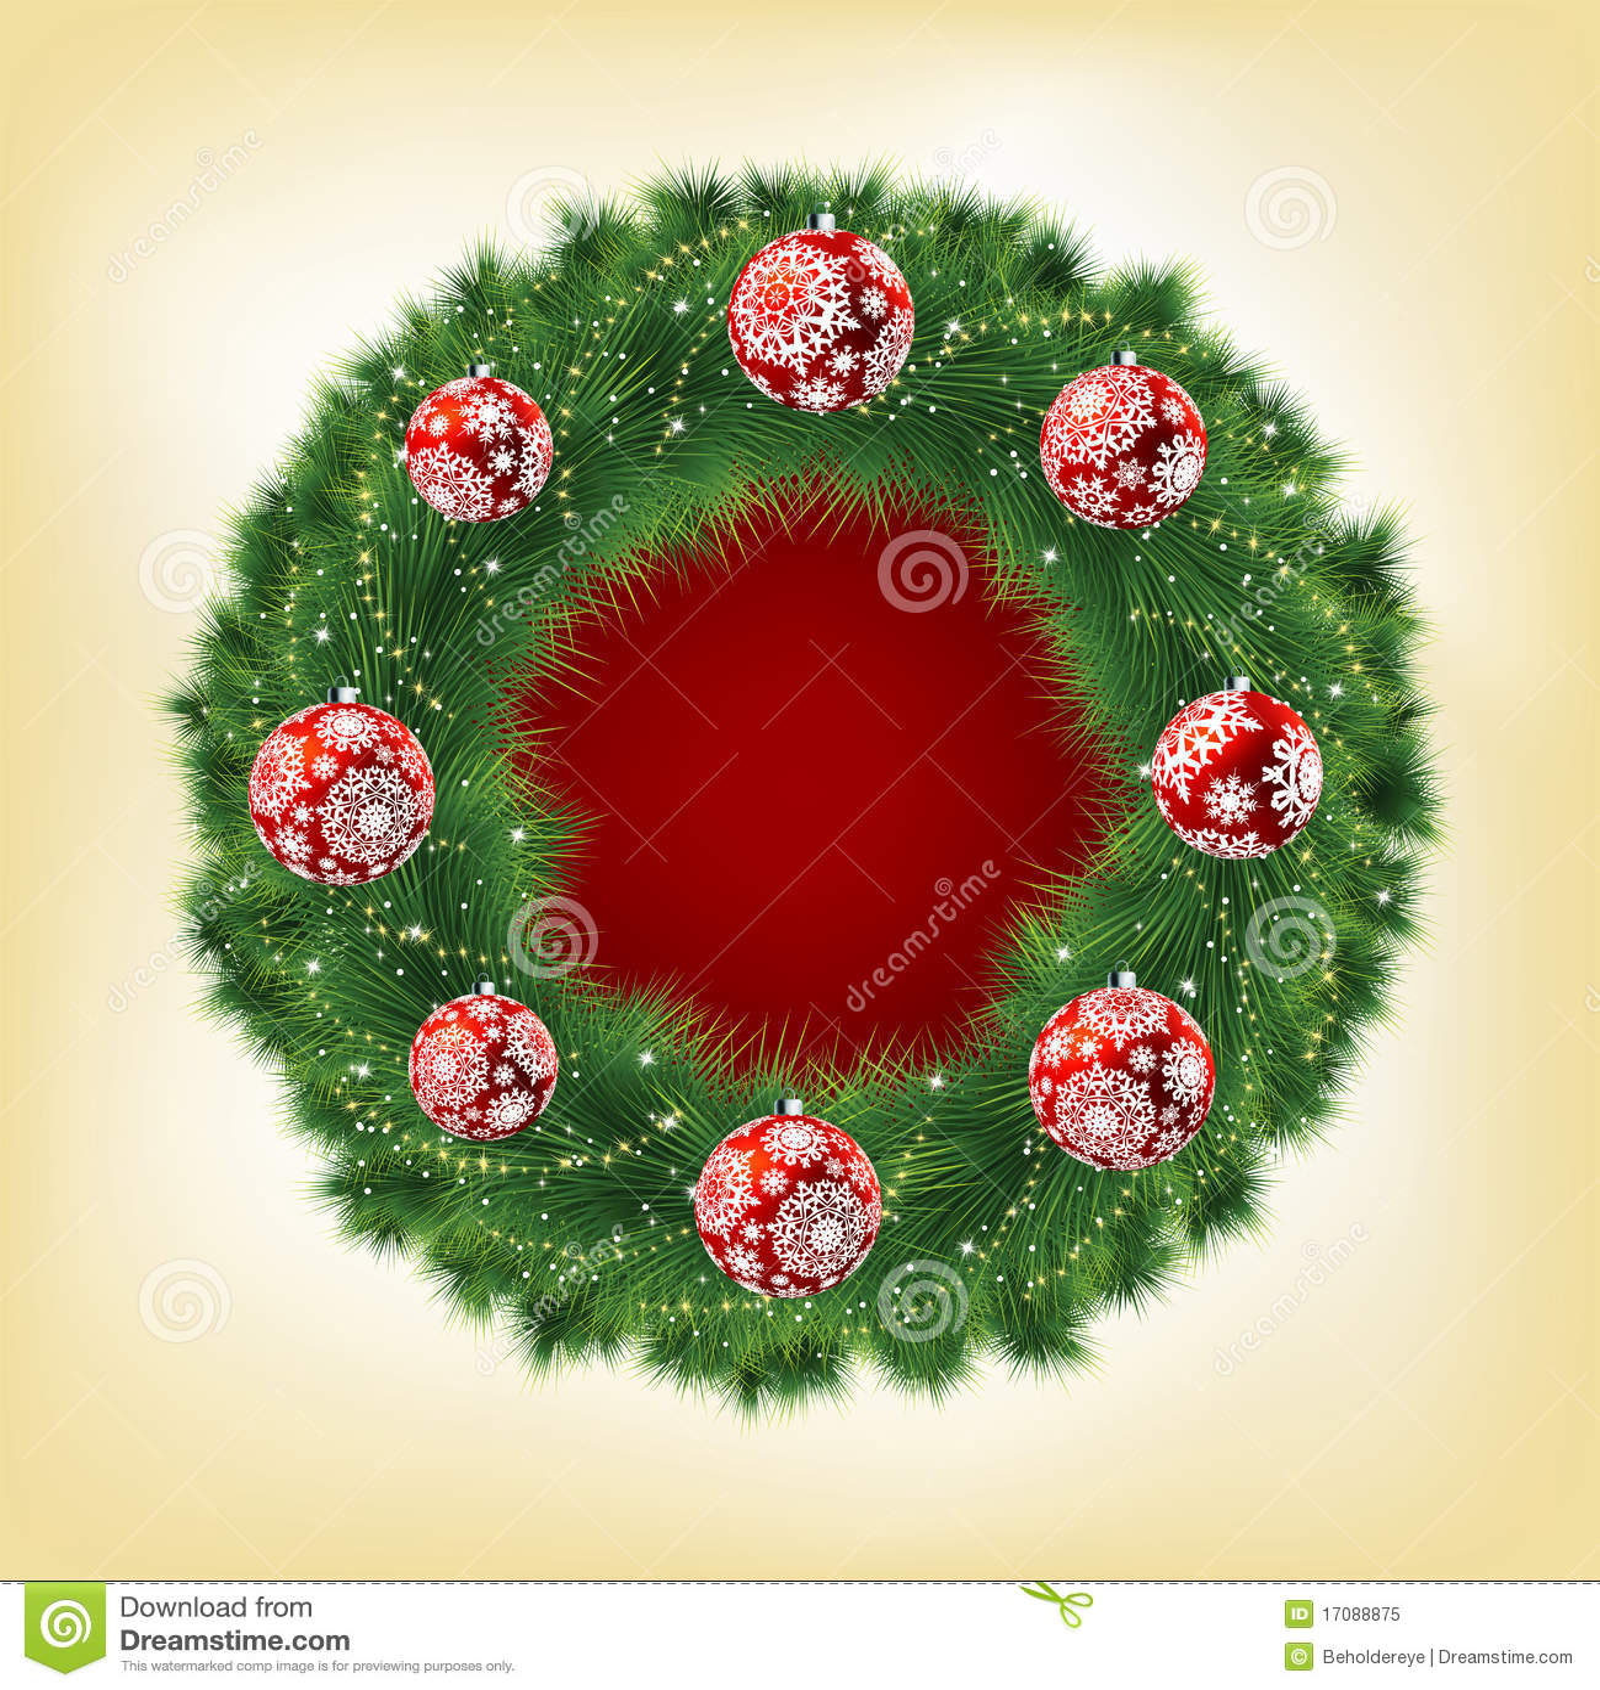 De slinger van Kerstmis. EPS 8